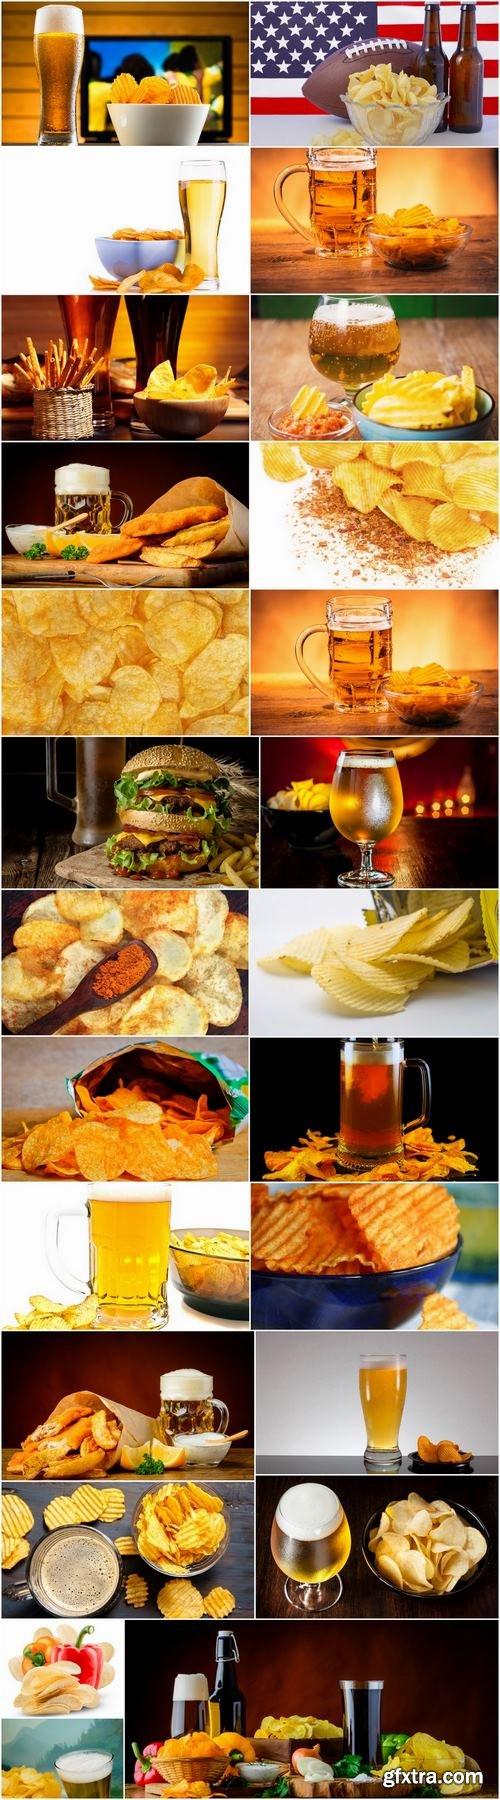 Potato chips beer snack 25 HQ Jpeg